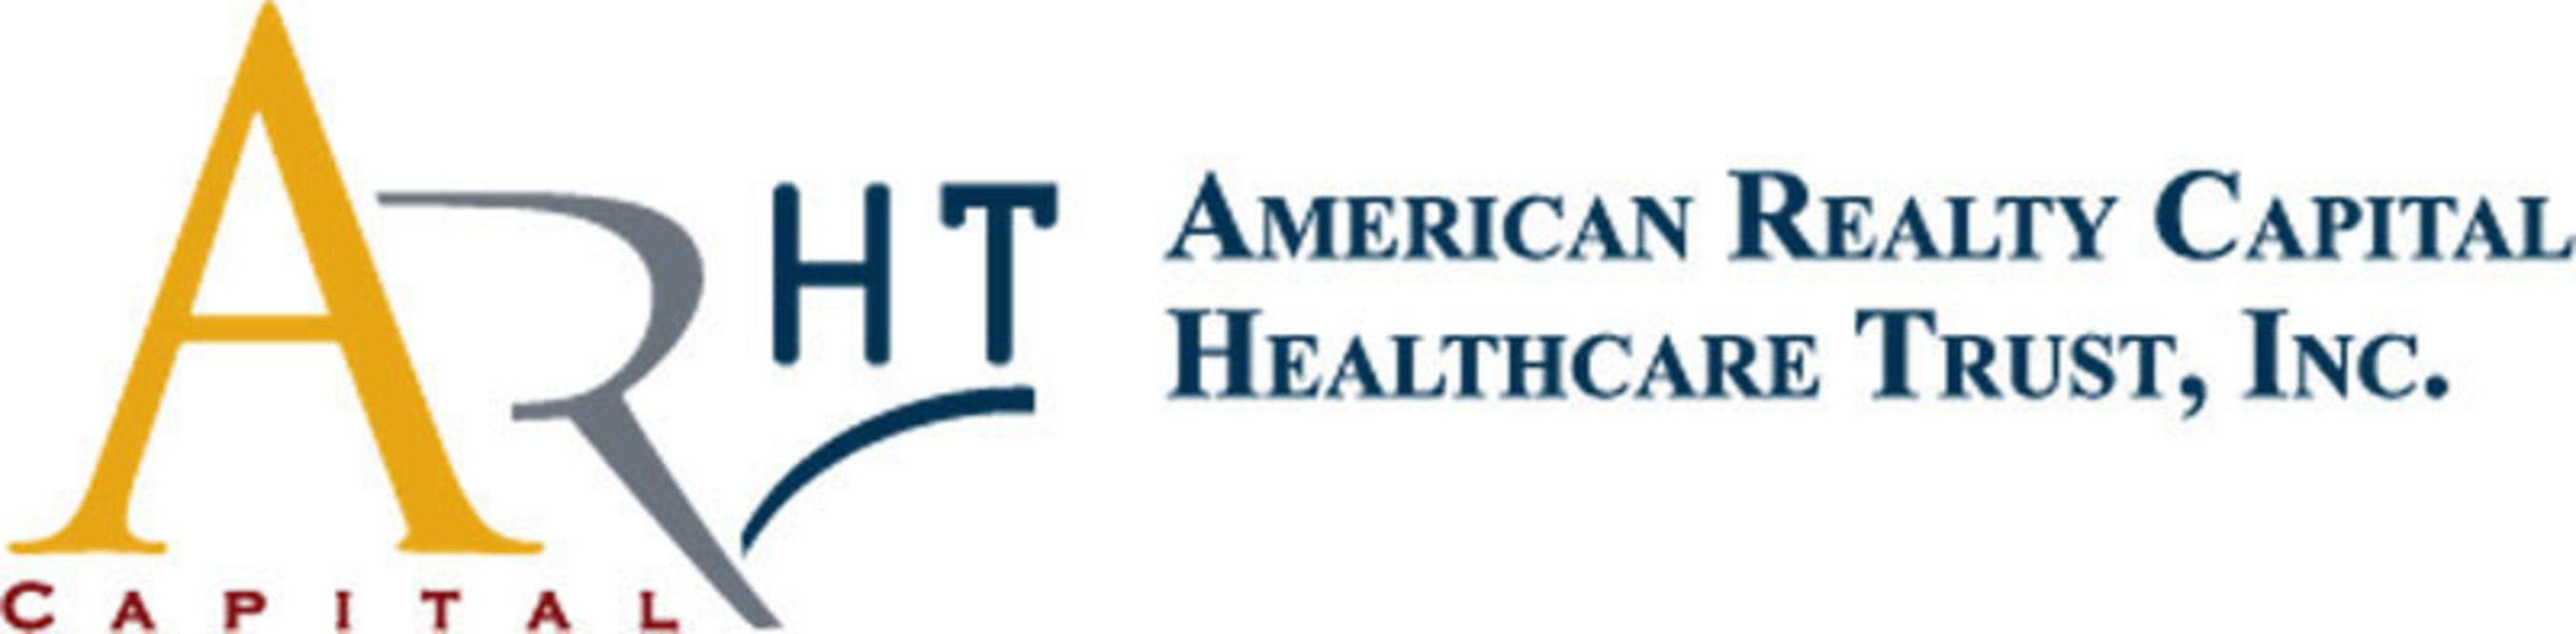 American Realty Capital Healthcare Trust, Inc.